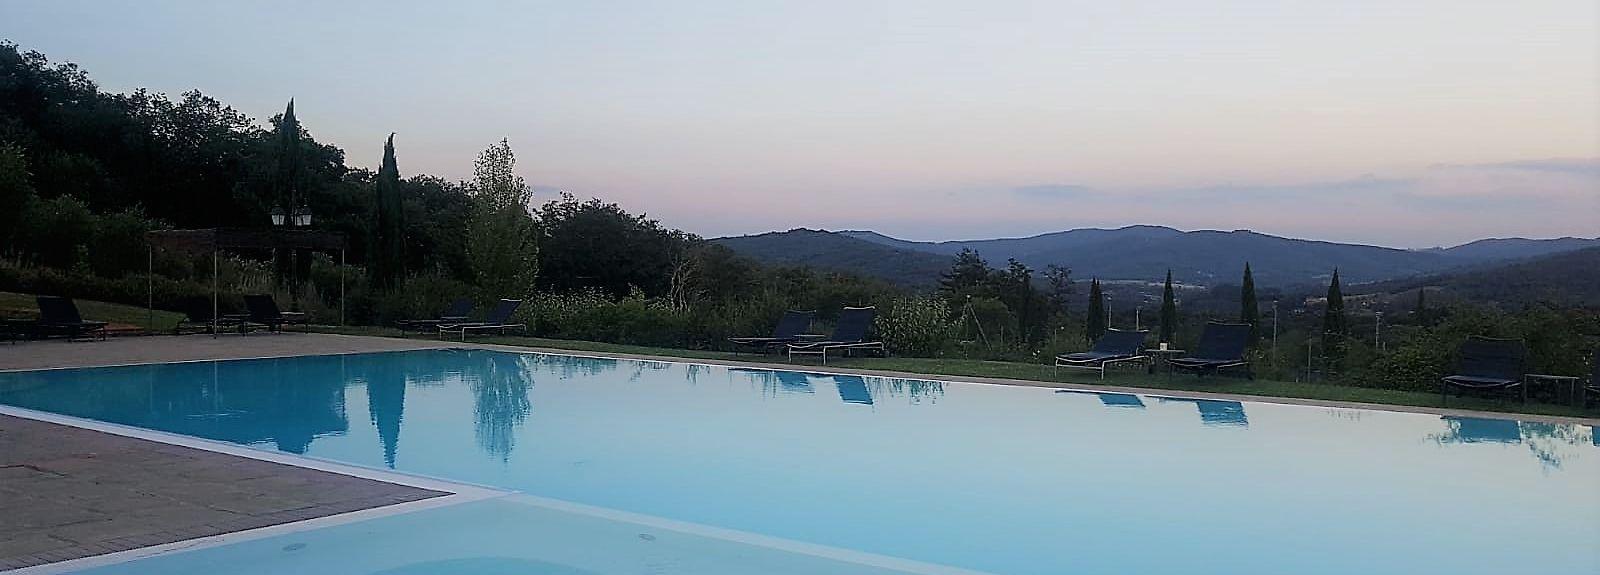 Montevarchi, Toscana, Italia